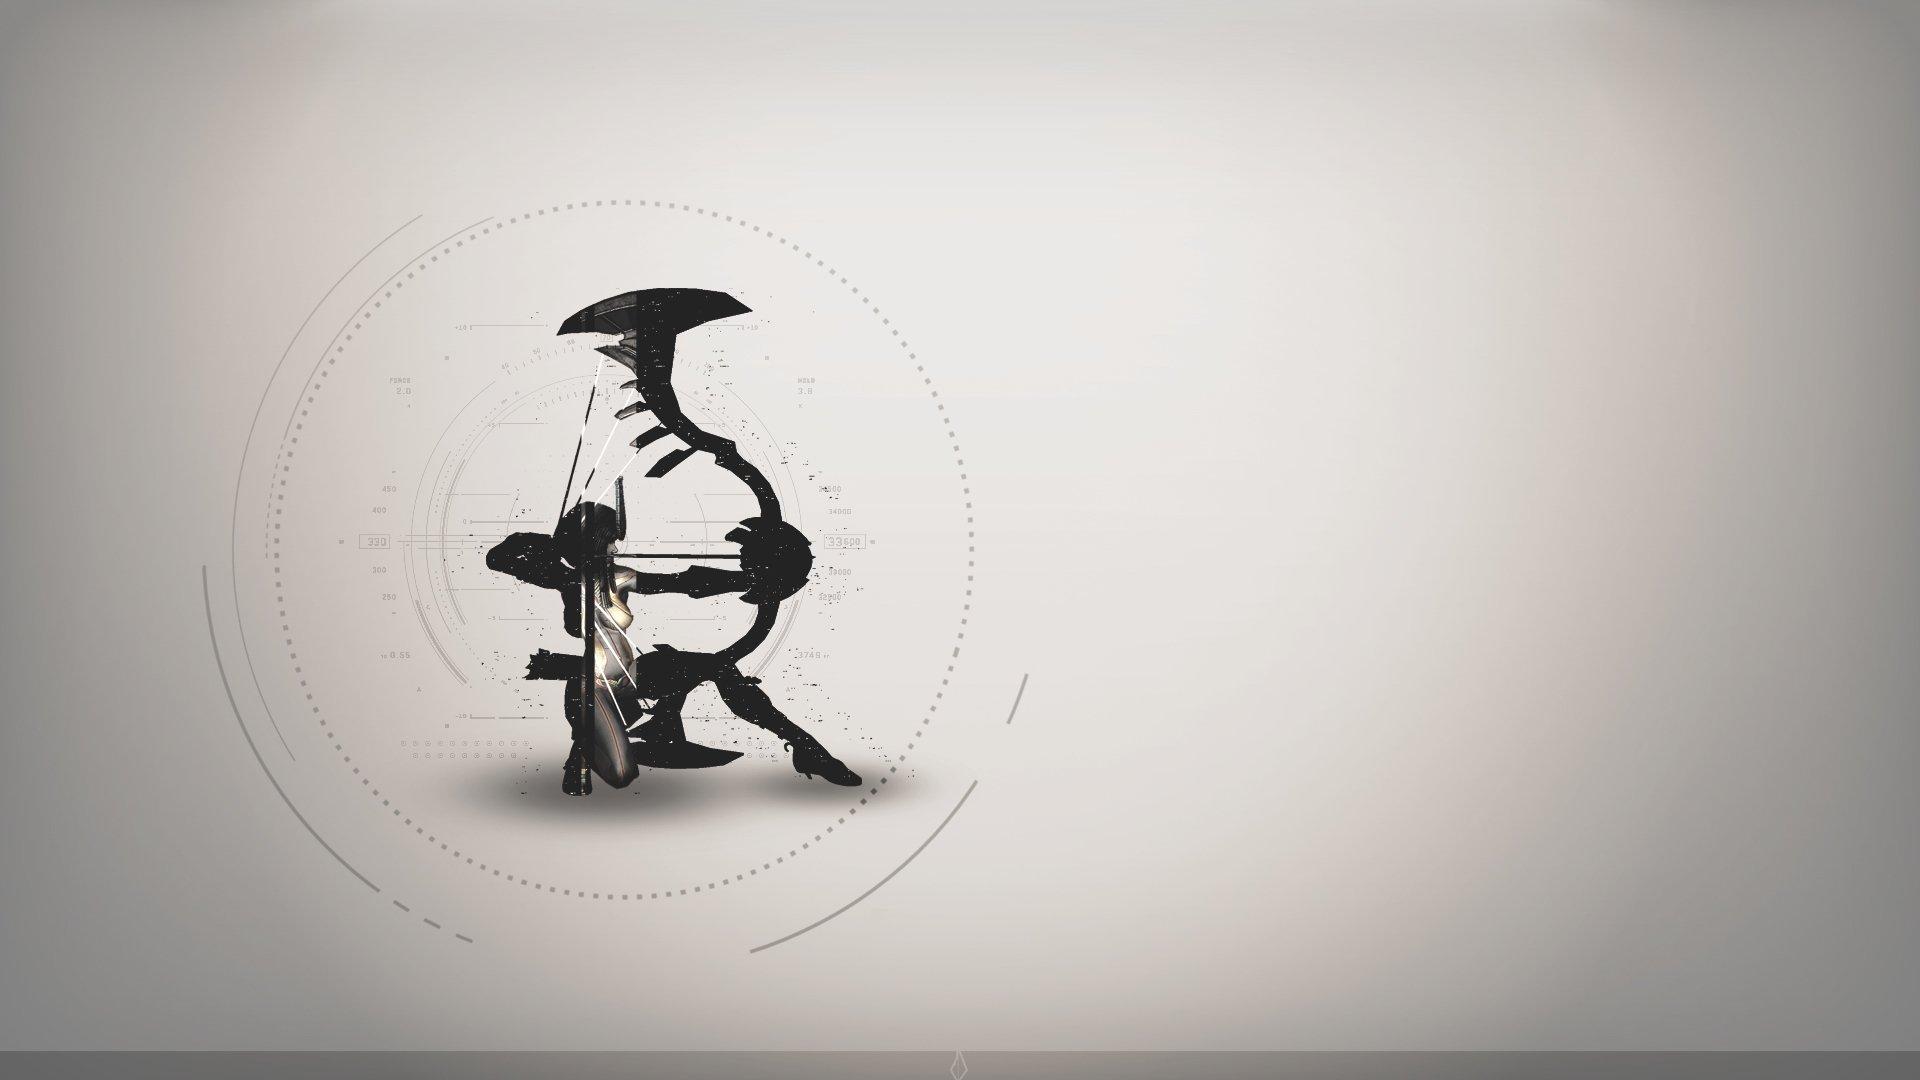 Video Game - Smite  Neith (Smite) Wallpaper